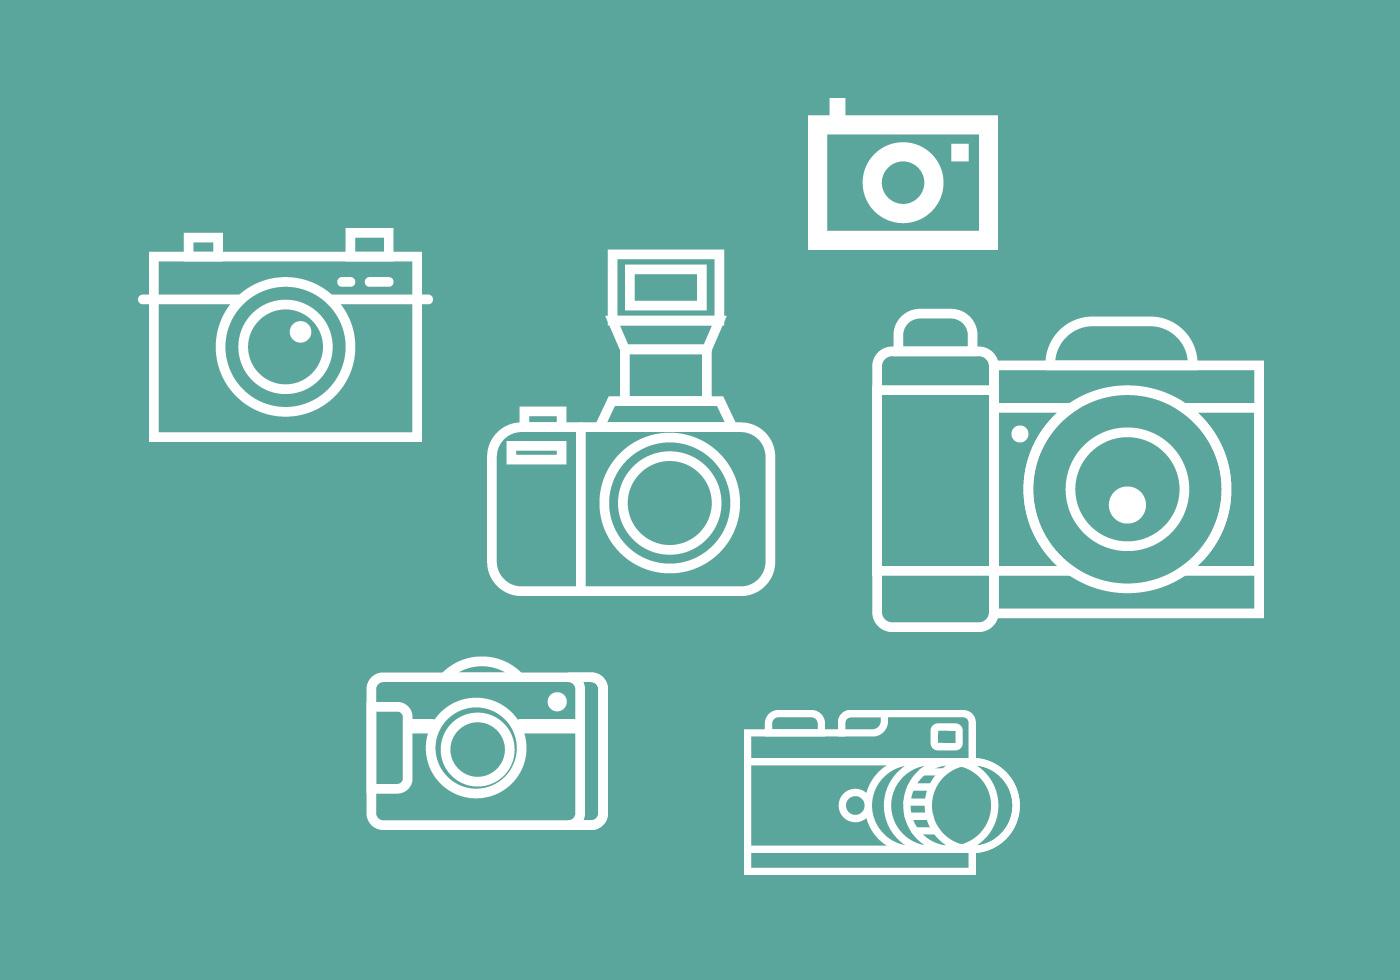 camara vector pack 2 download free vector art stock